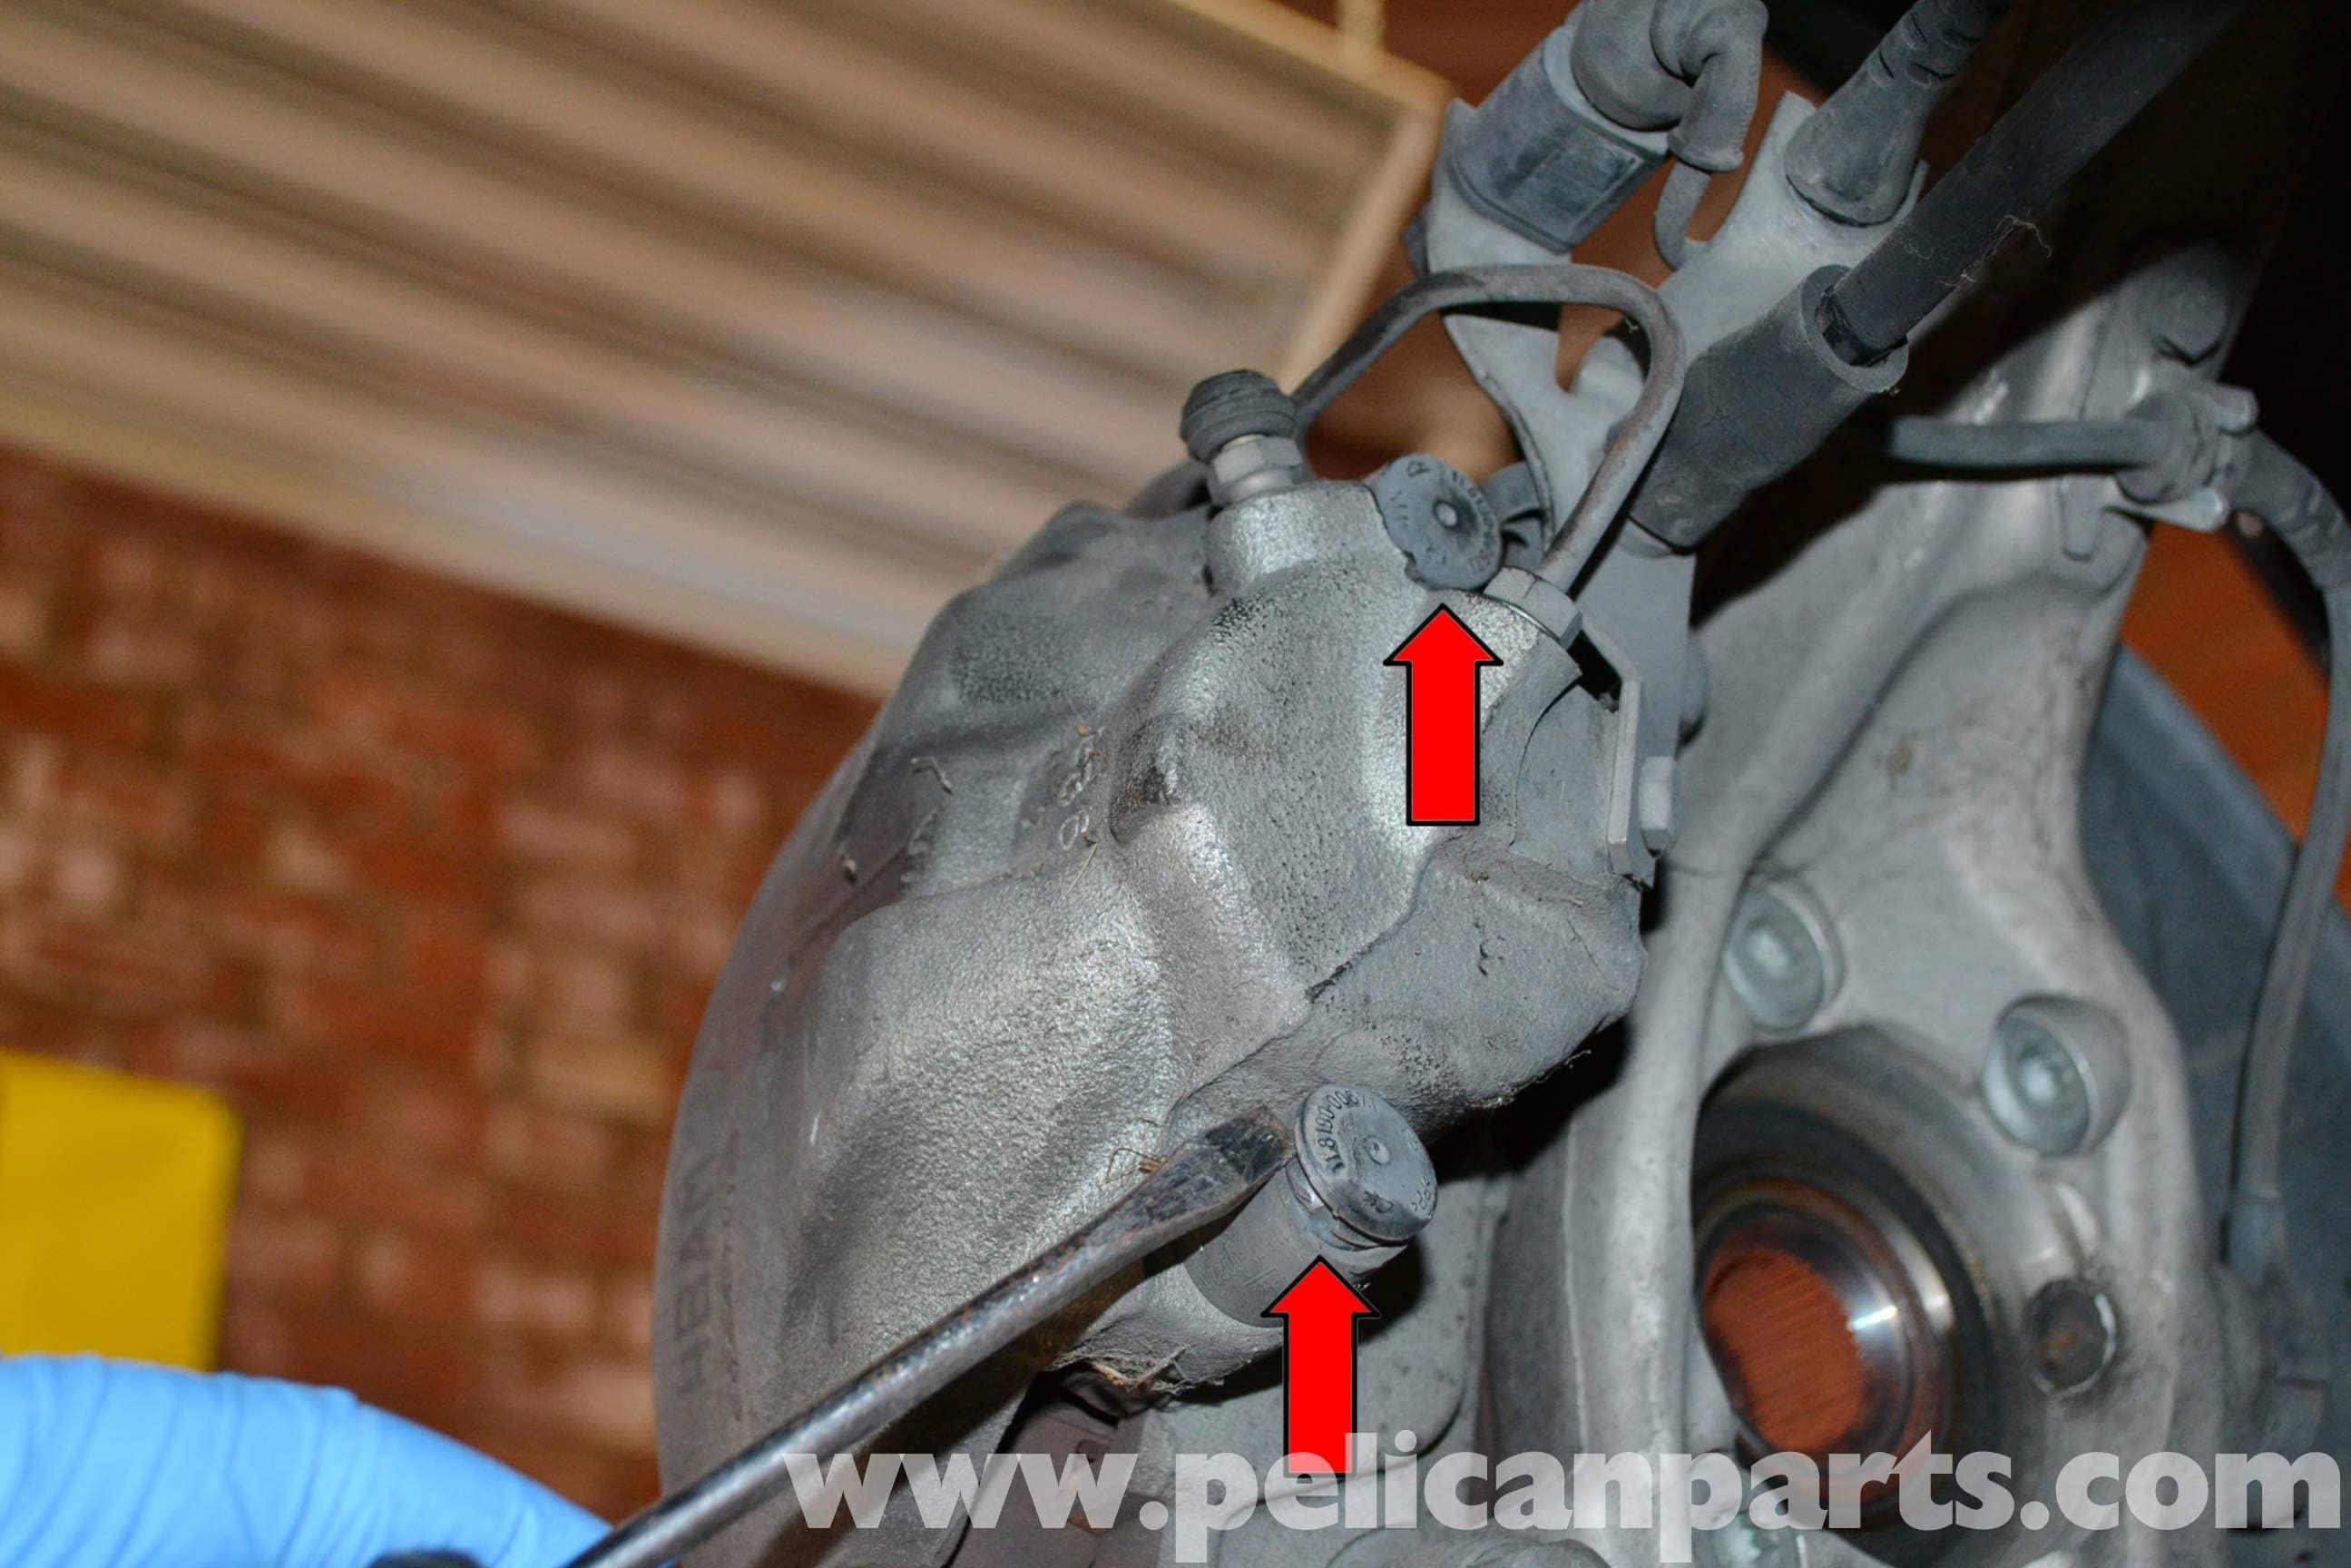 Audi A4 B6 Front Brake Pad Replacement (2002-2008) | Pelican